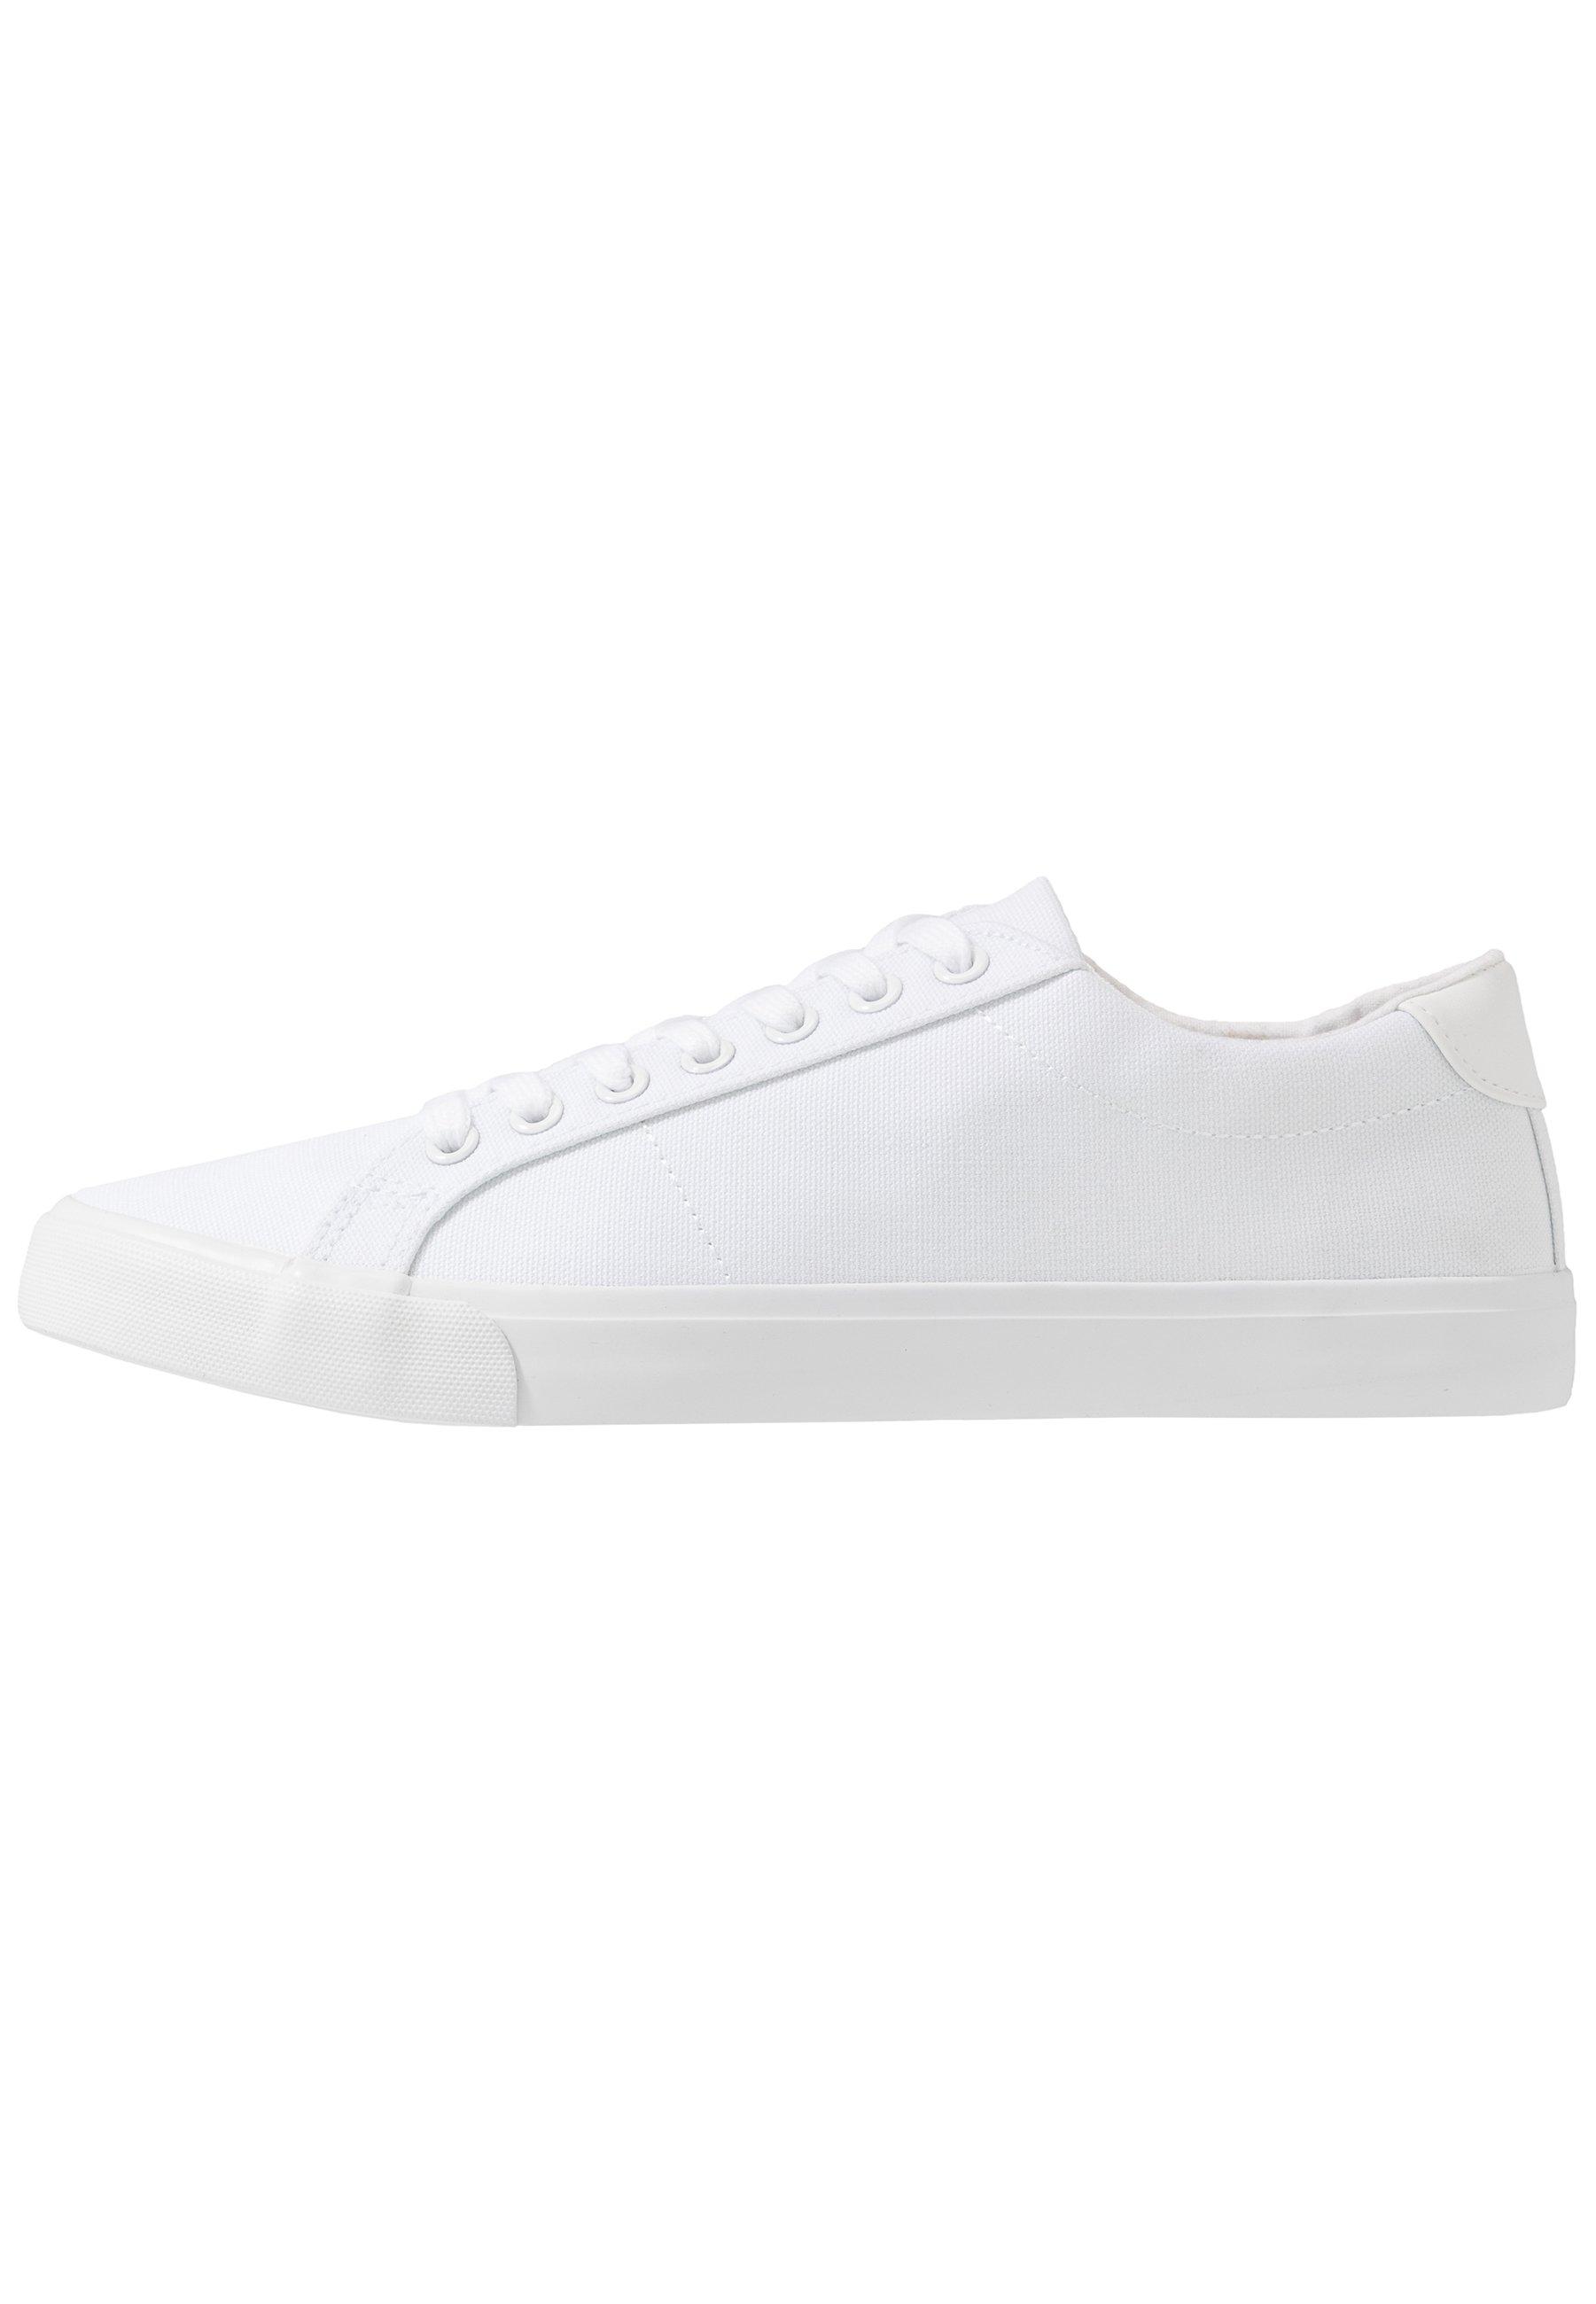 Schuhe online shoppen | Versandkostenfrei bei Zalando